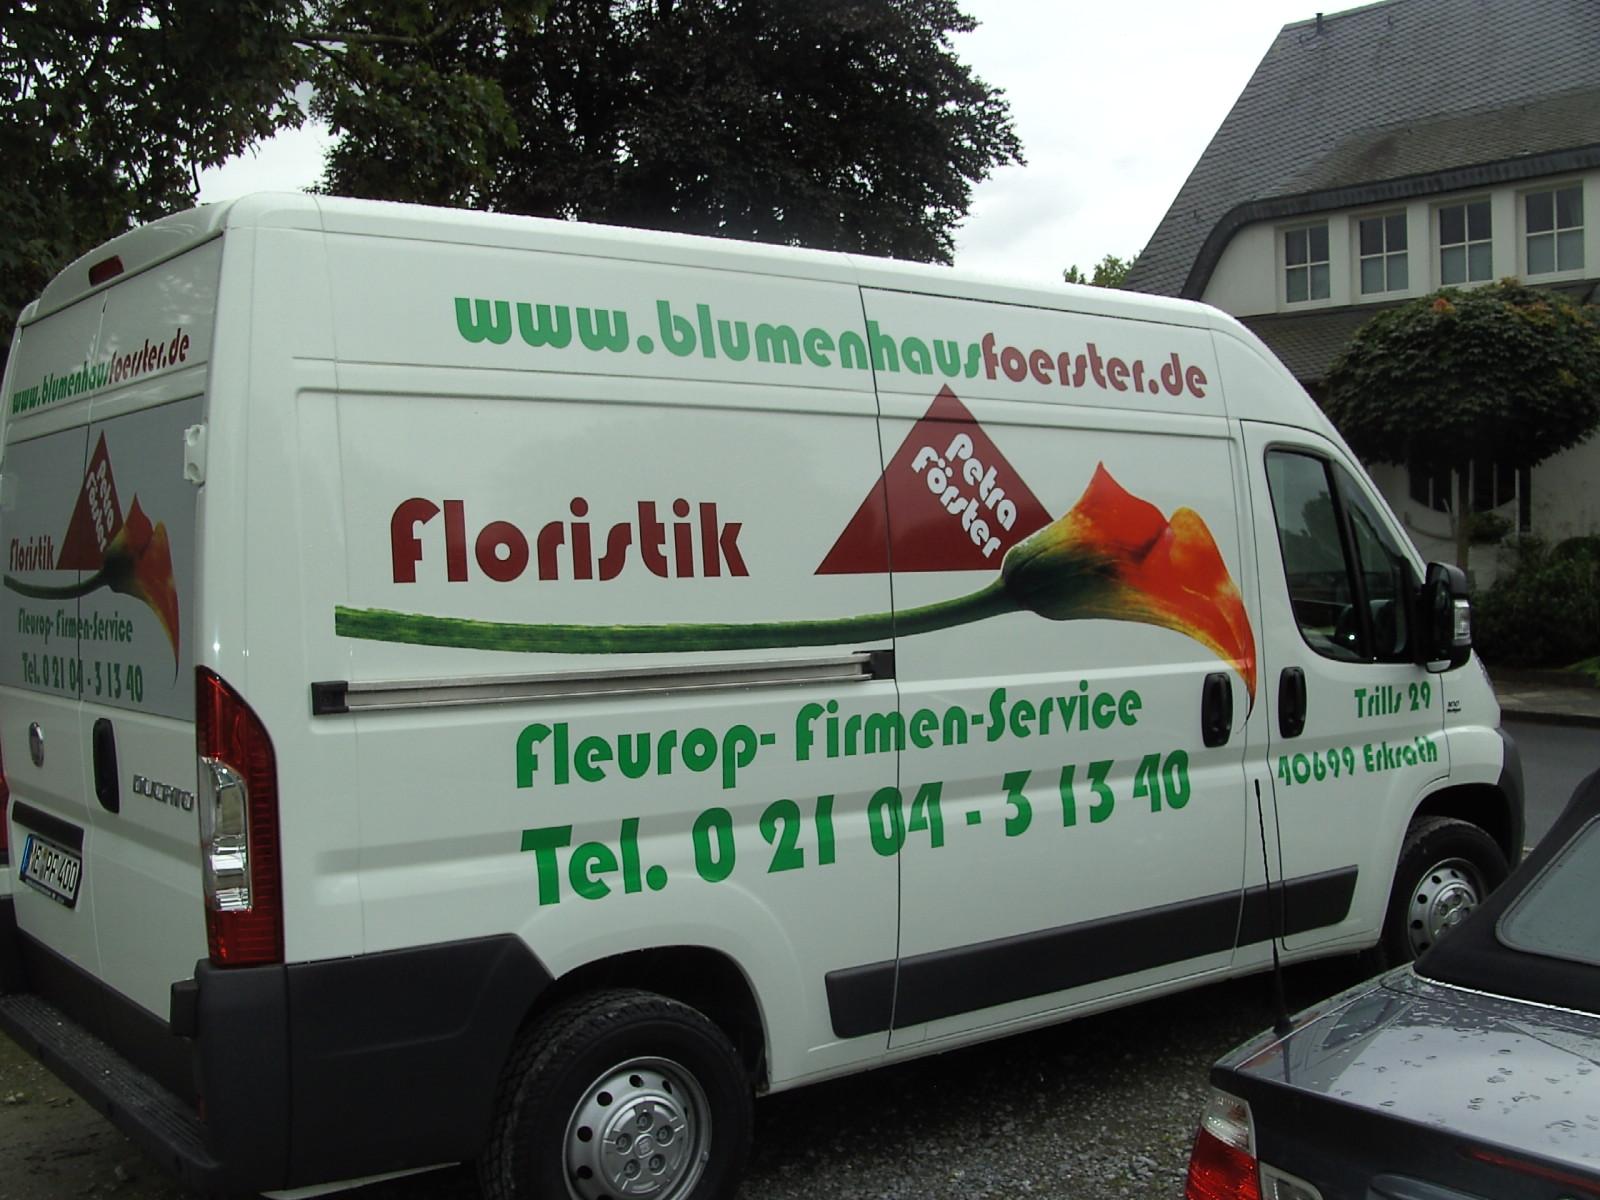 Floristik Autowerbung mit Klebefolie realisiert